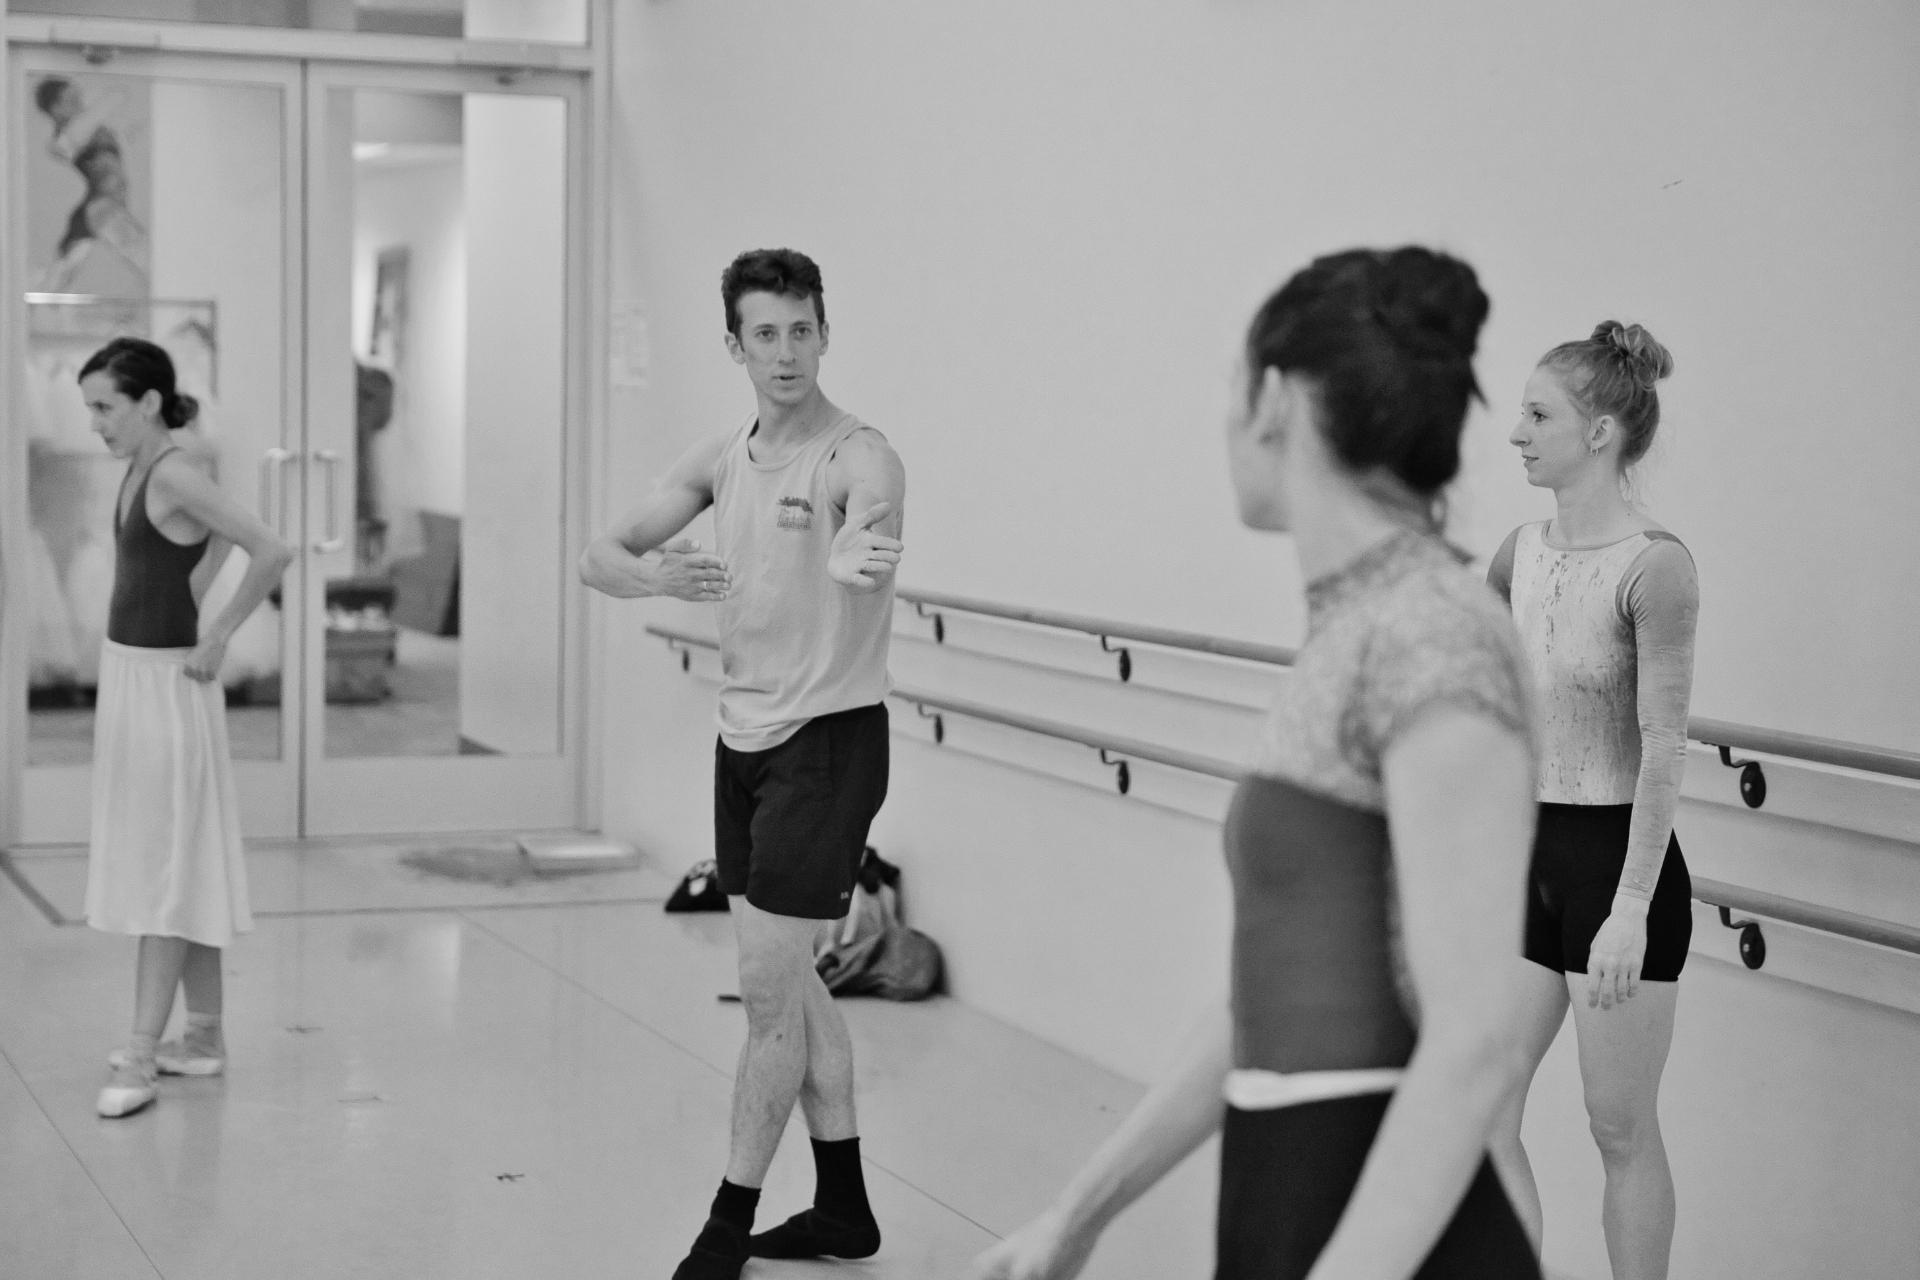 ©Brian Simcoe. Rehearsal shot of 'Life After Human Life' - Shaker Loops